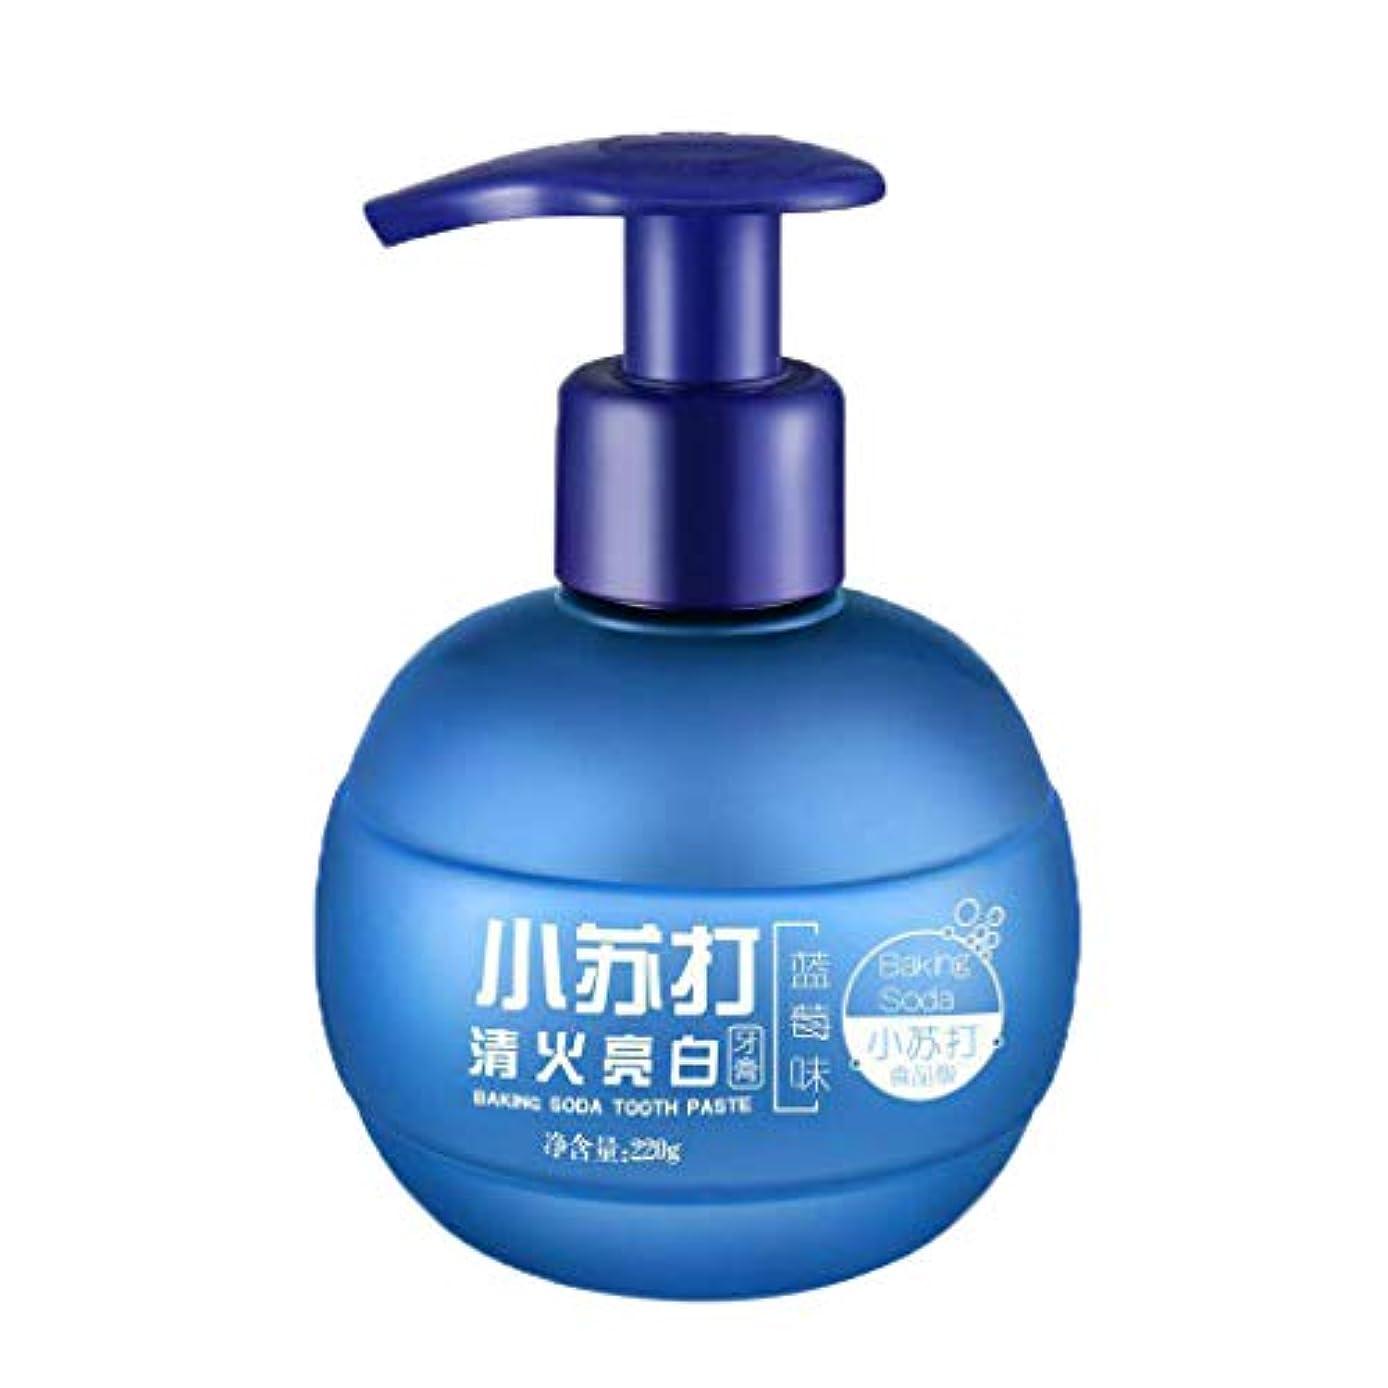 Dream 歯磨き粉 歯みがき 歯周プロケア 歯科用 ソーダ 口臭予防 美白 220g (ブルー)